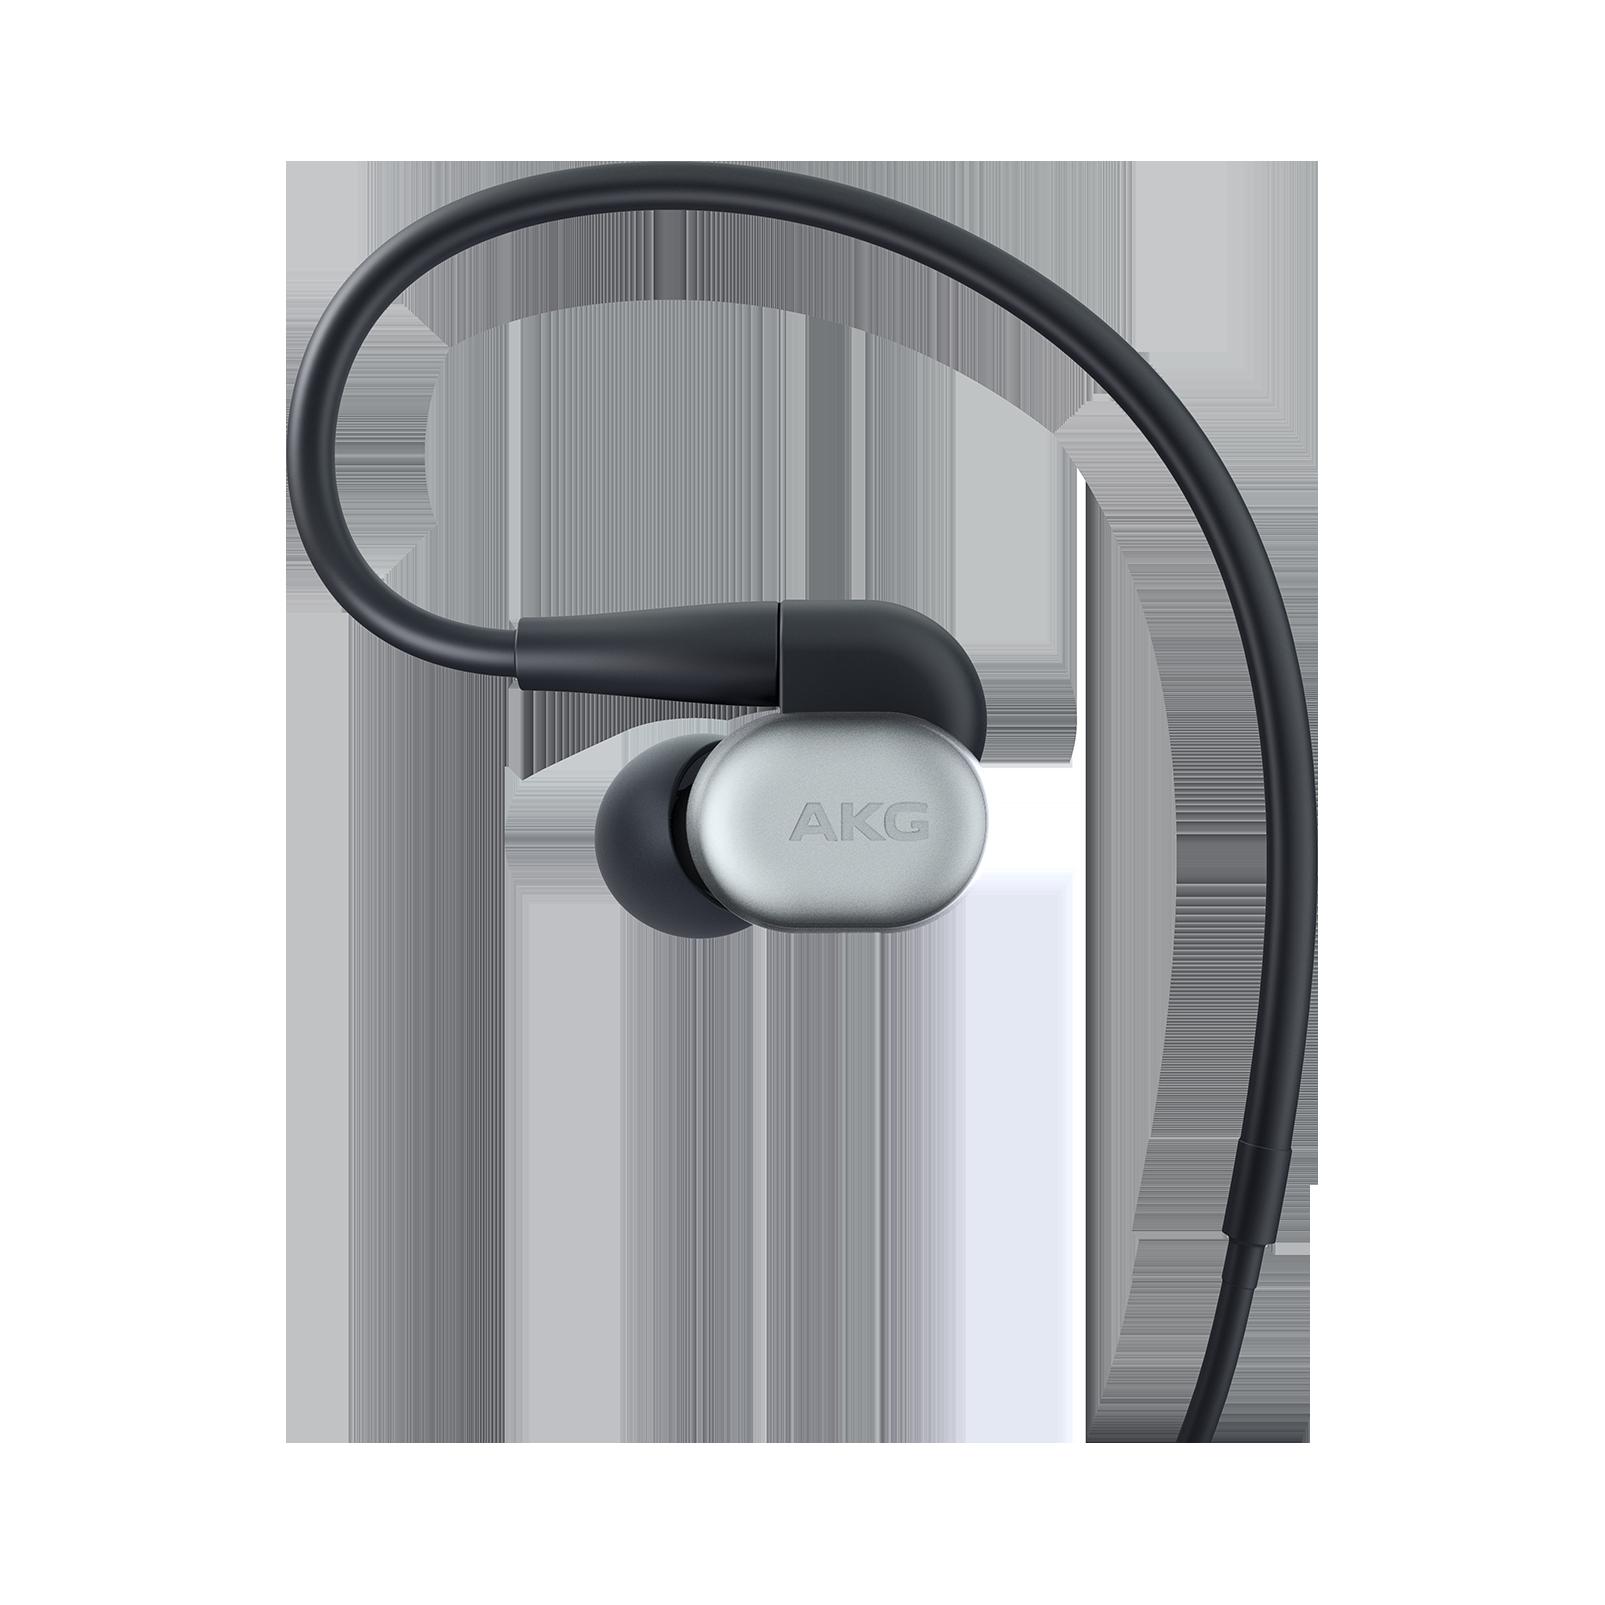 AKG N30 - Silver - Hi-Res in-ear headphones with customizable sound - Detailshot 1